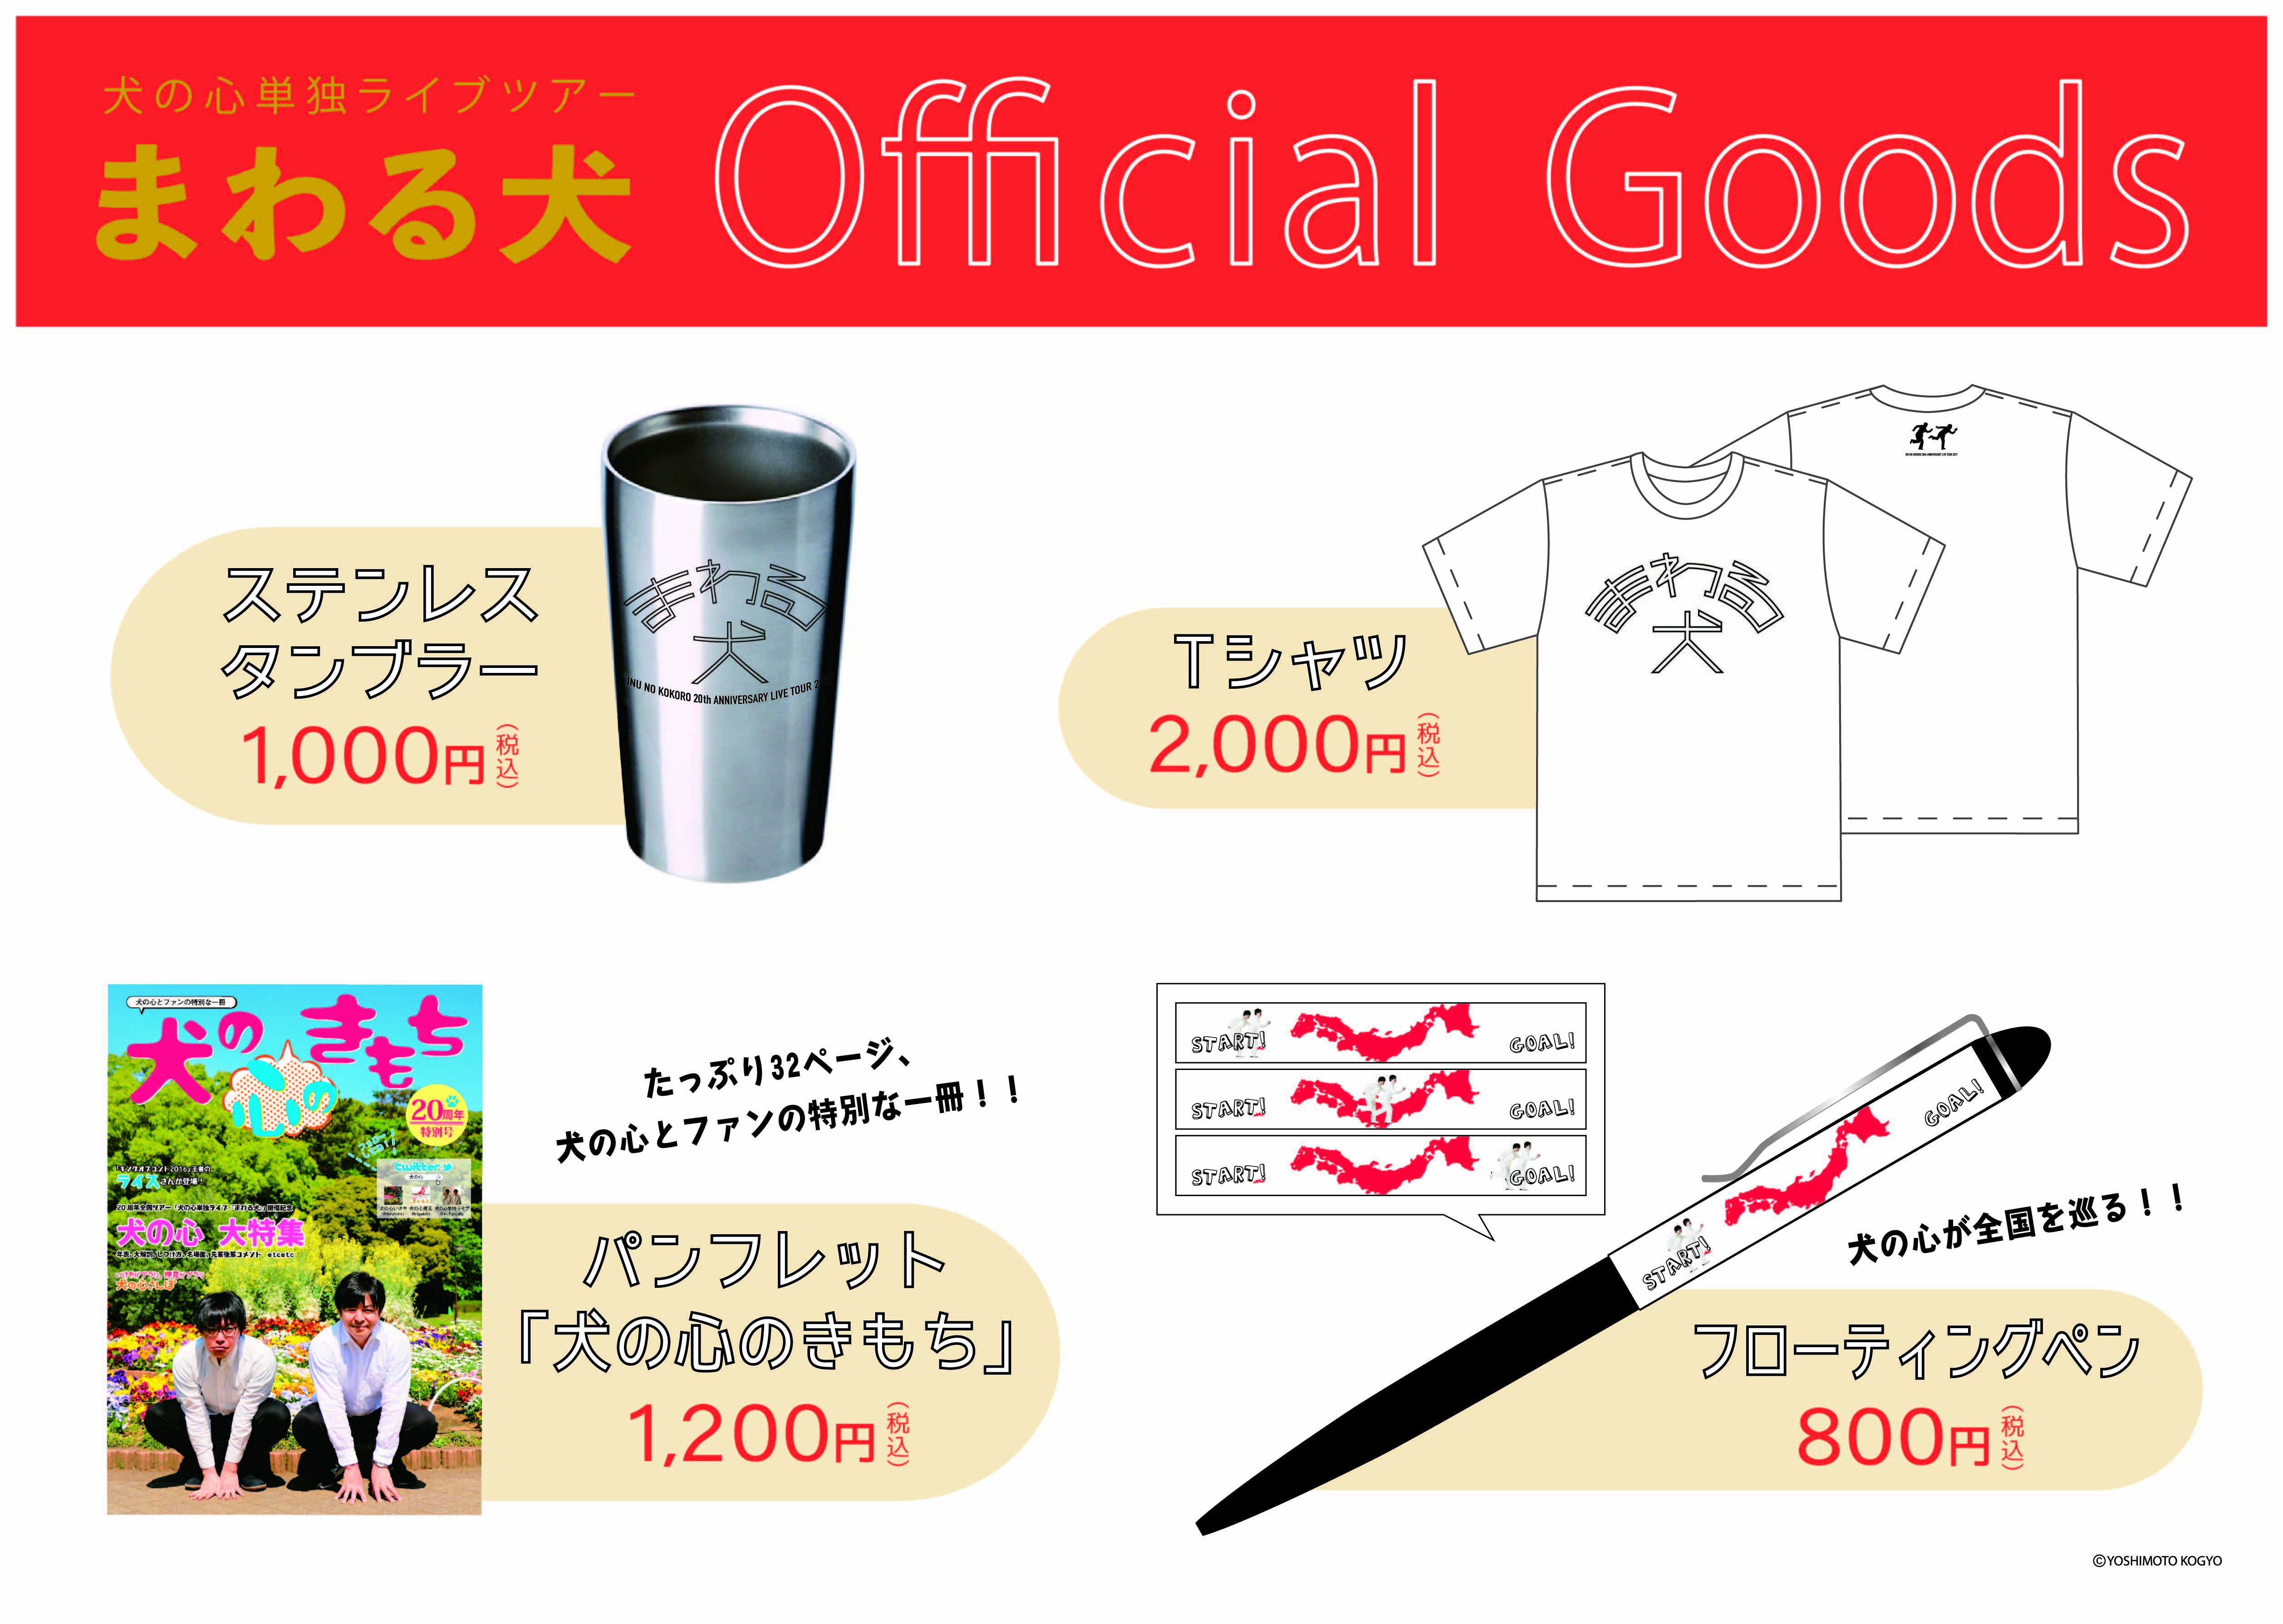 http://news.yoshimoto.co.jp/20170531153956-05414e3fbe47940b7793449f98a60f81eda746ad.jpg